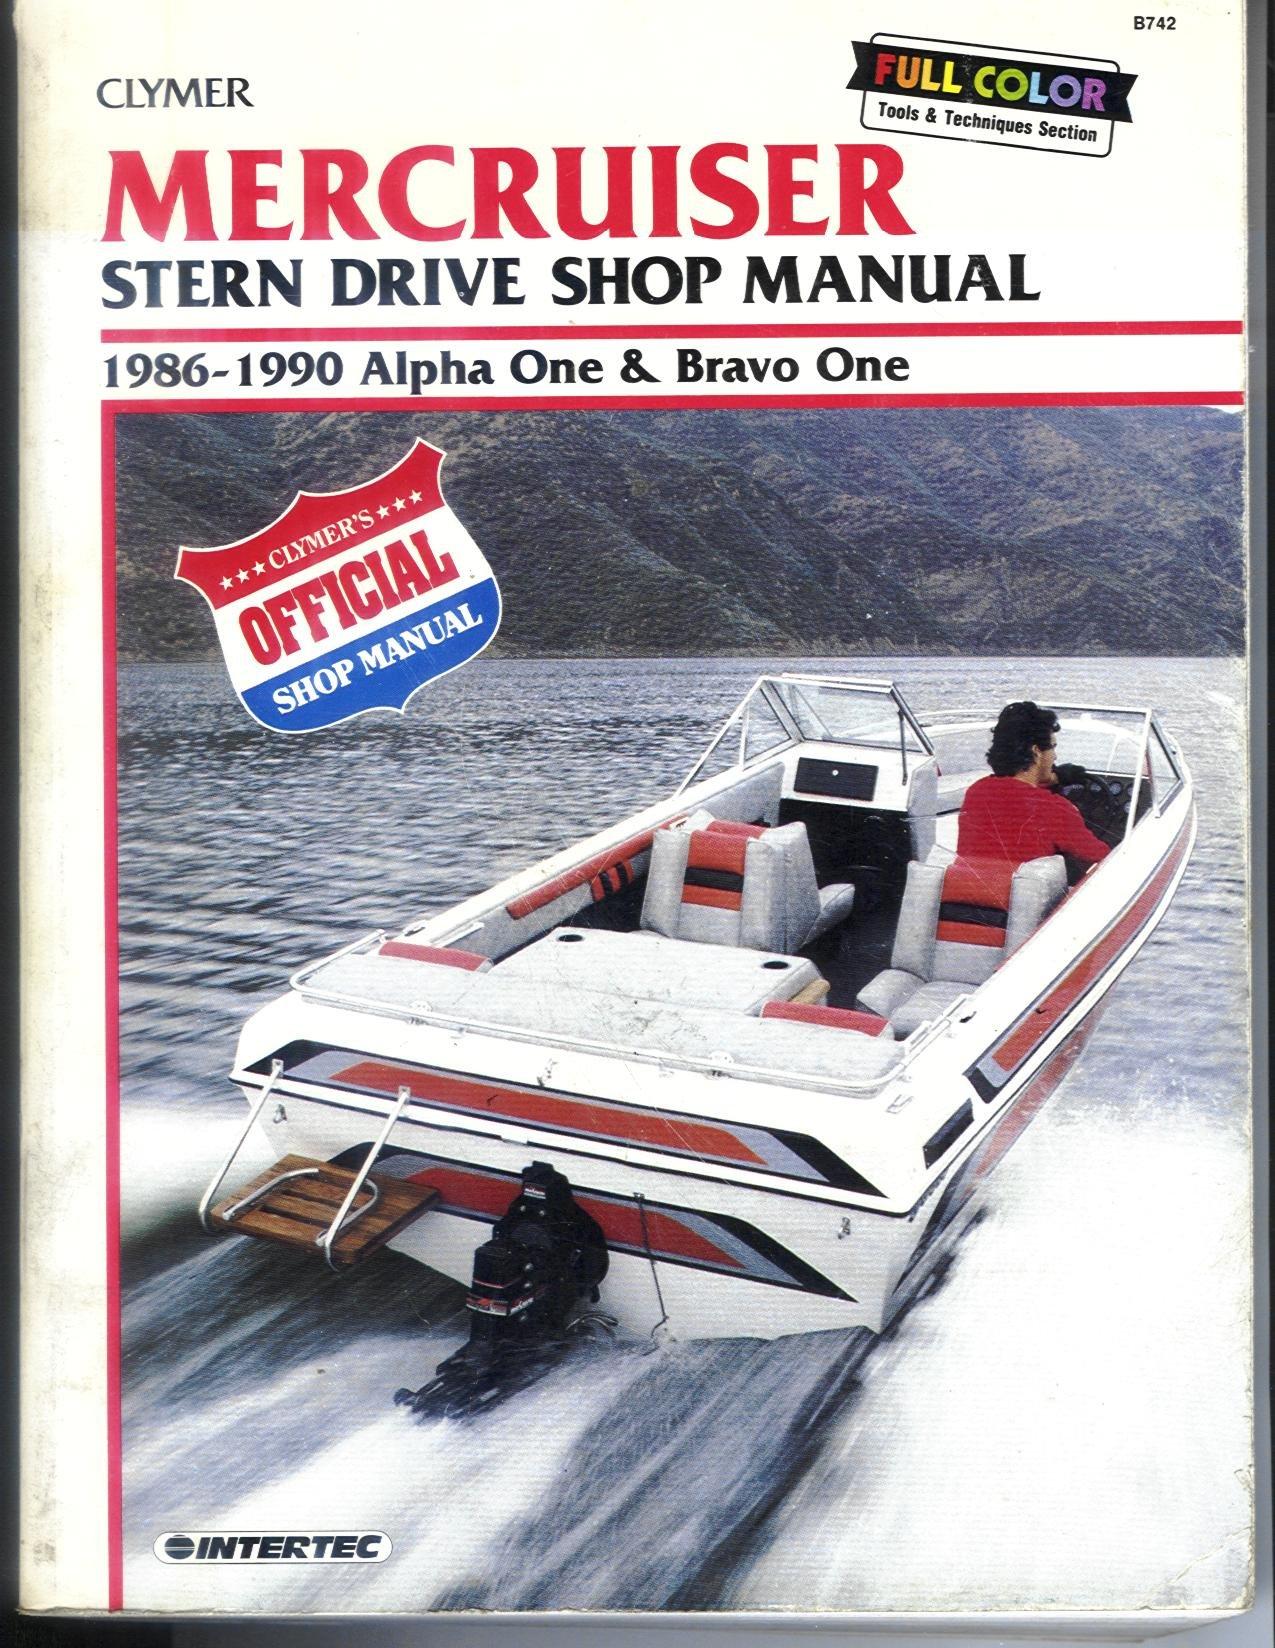 Clymer MerCruiser stern drive shop manual: 1986-1990 Alpha One and Bravo One:  Ron Wright: 9780892875535: Amazon.com: Books